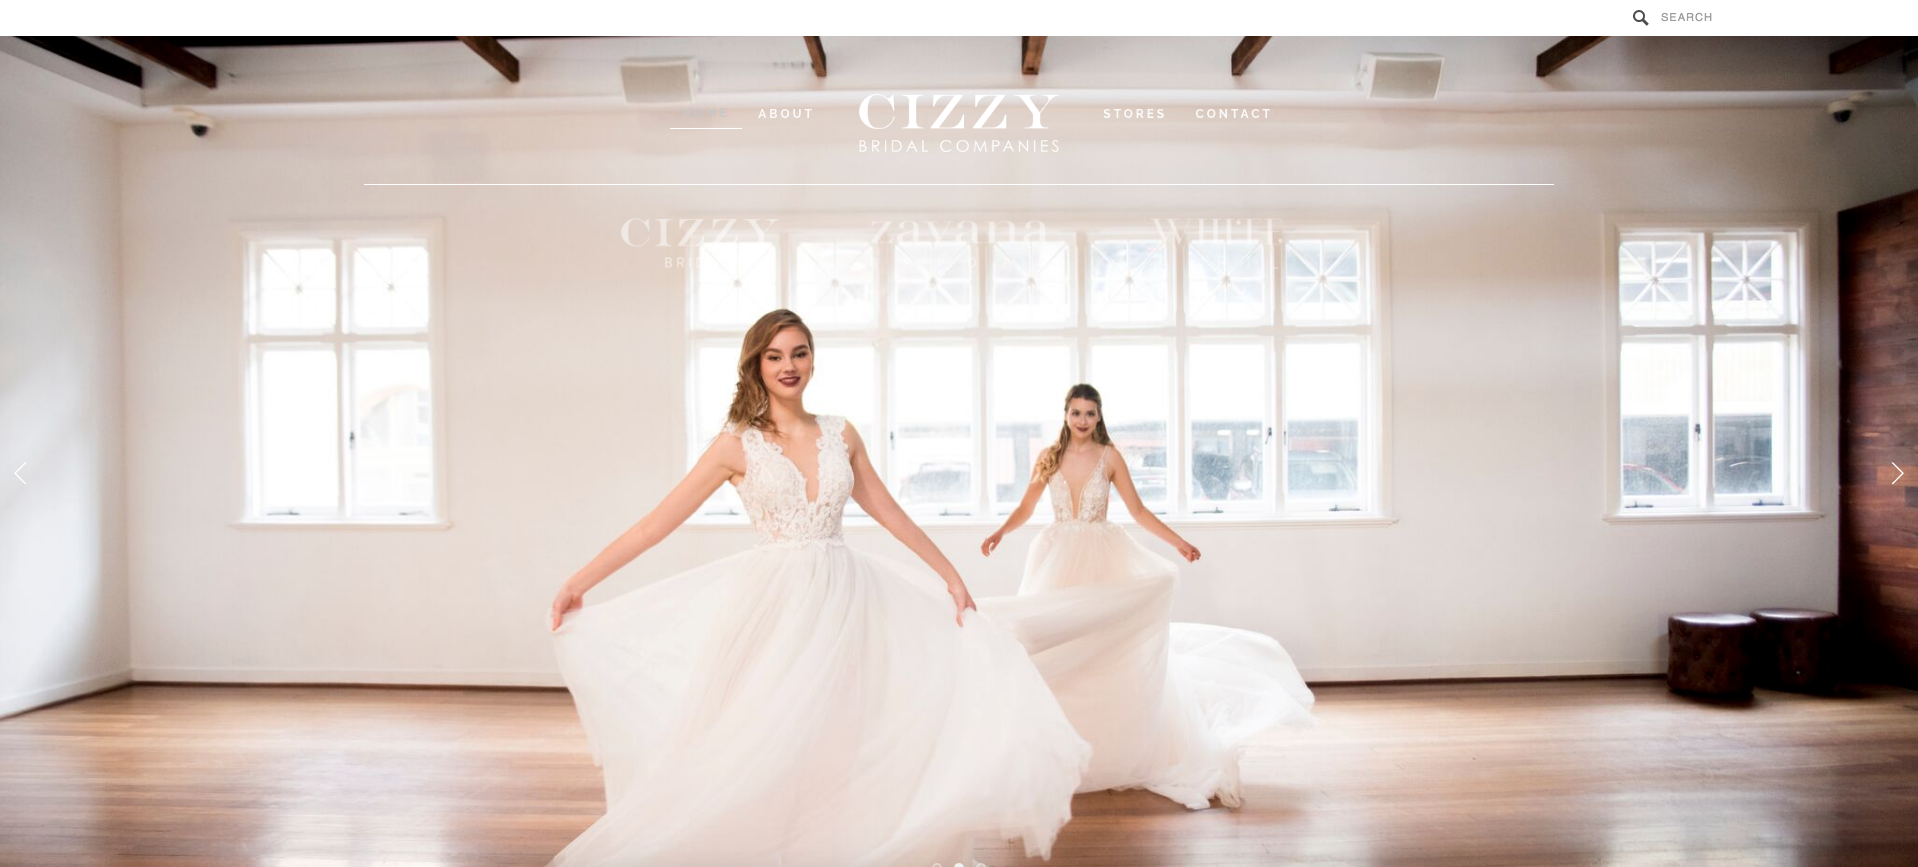 CIZZY BRIDAL COMPANIES - BRIDAL WEBSITE